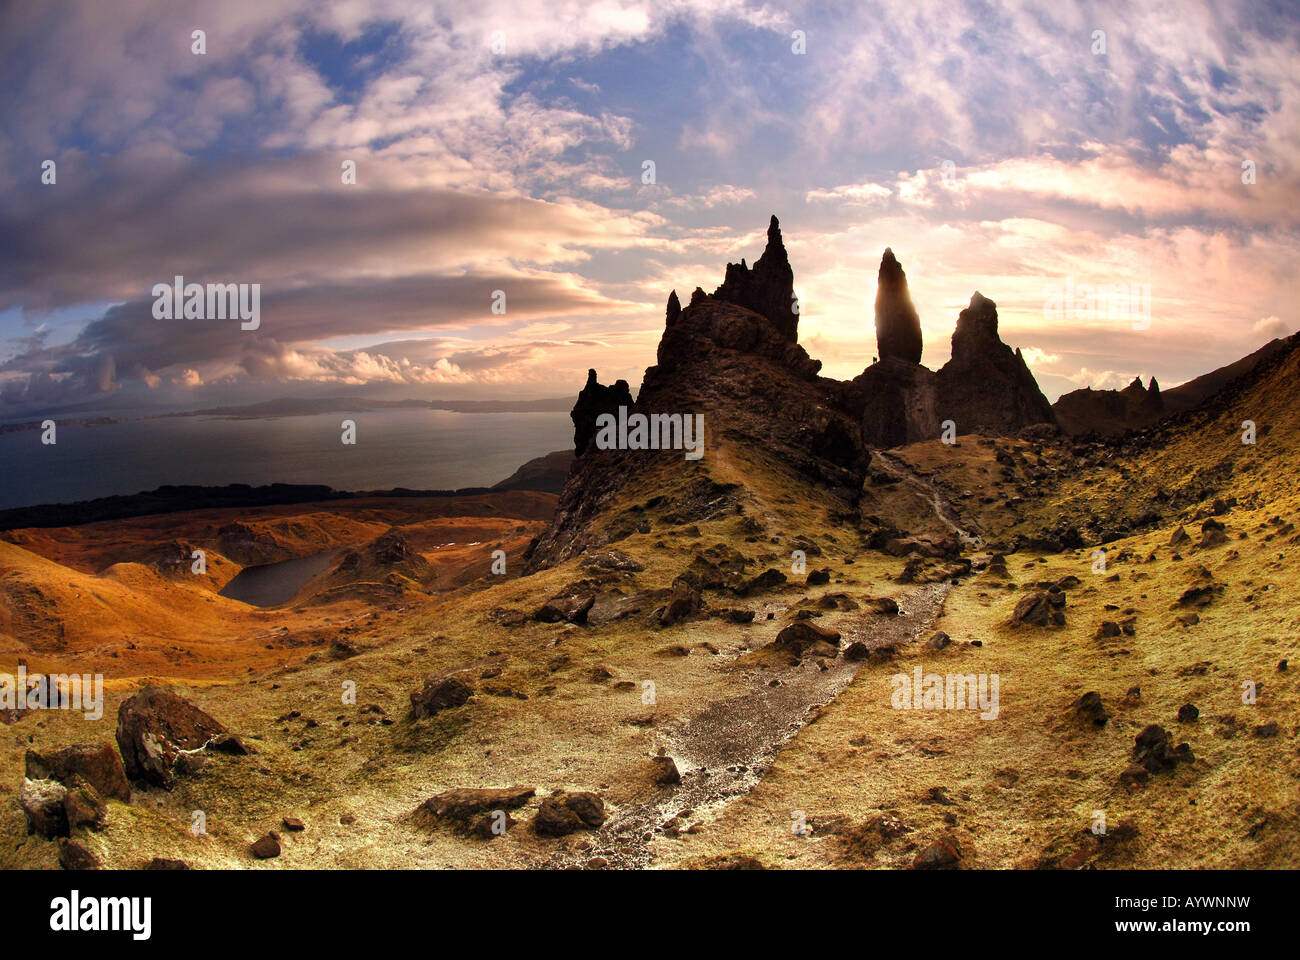 Scotland isle of skye old man of storr - Stock Image